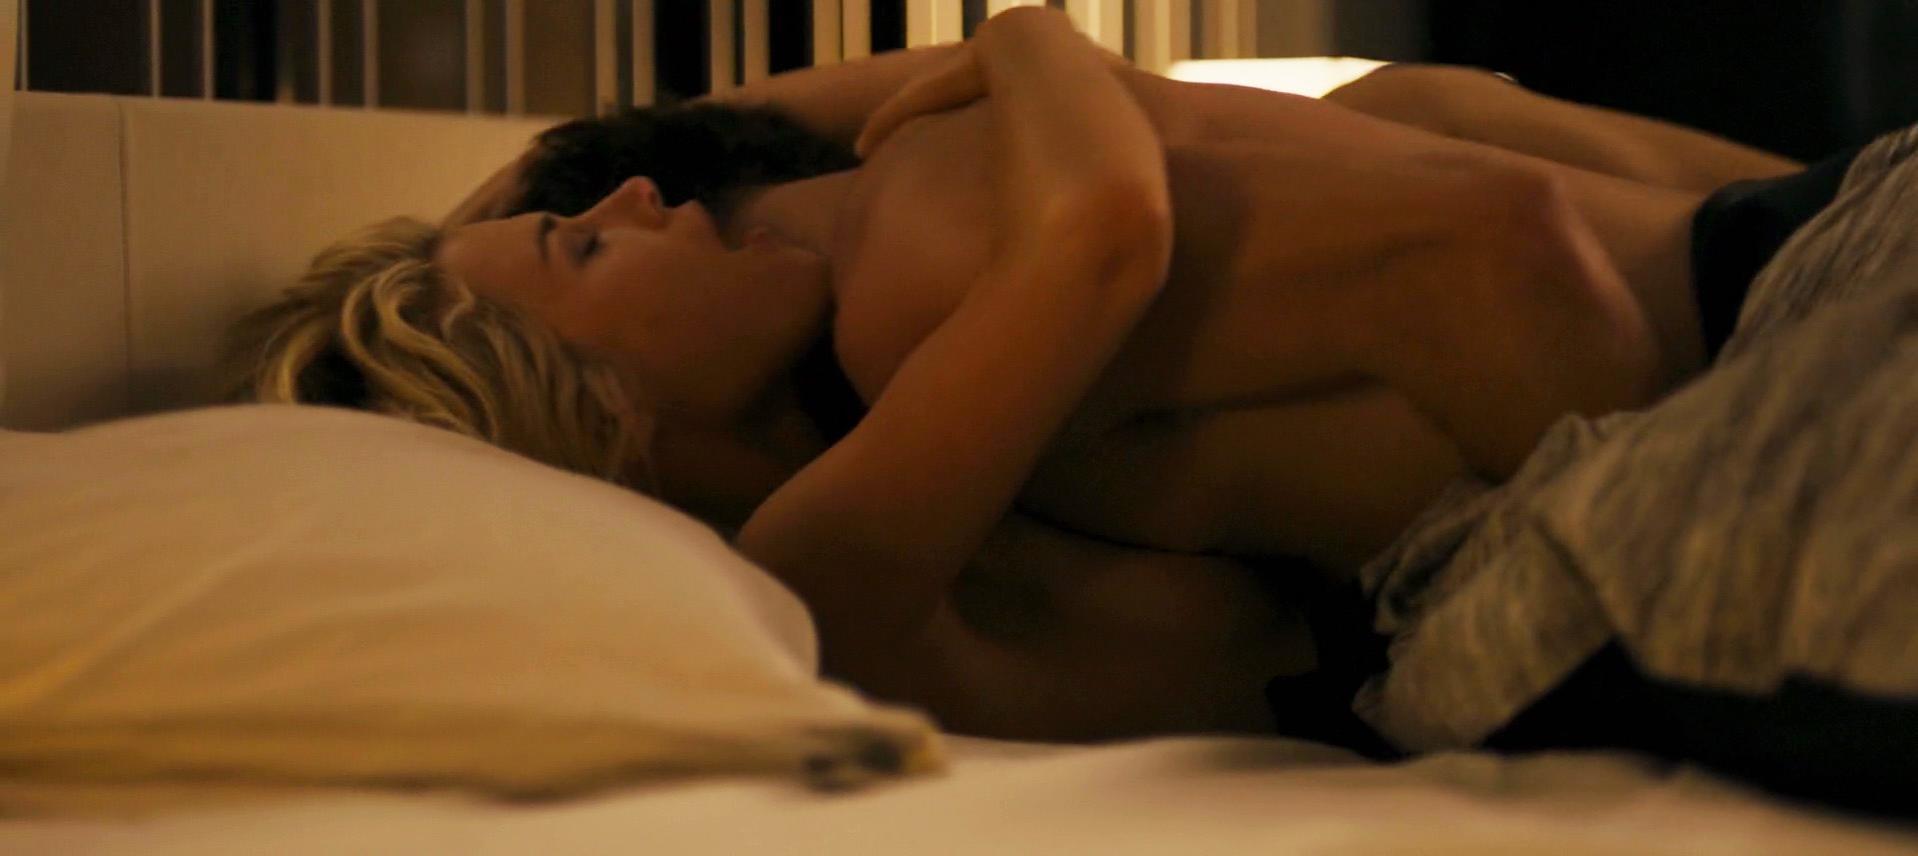 Jessica taylor haid nude sex scene on scandalplanetcom - 1 6